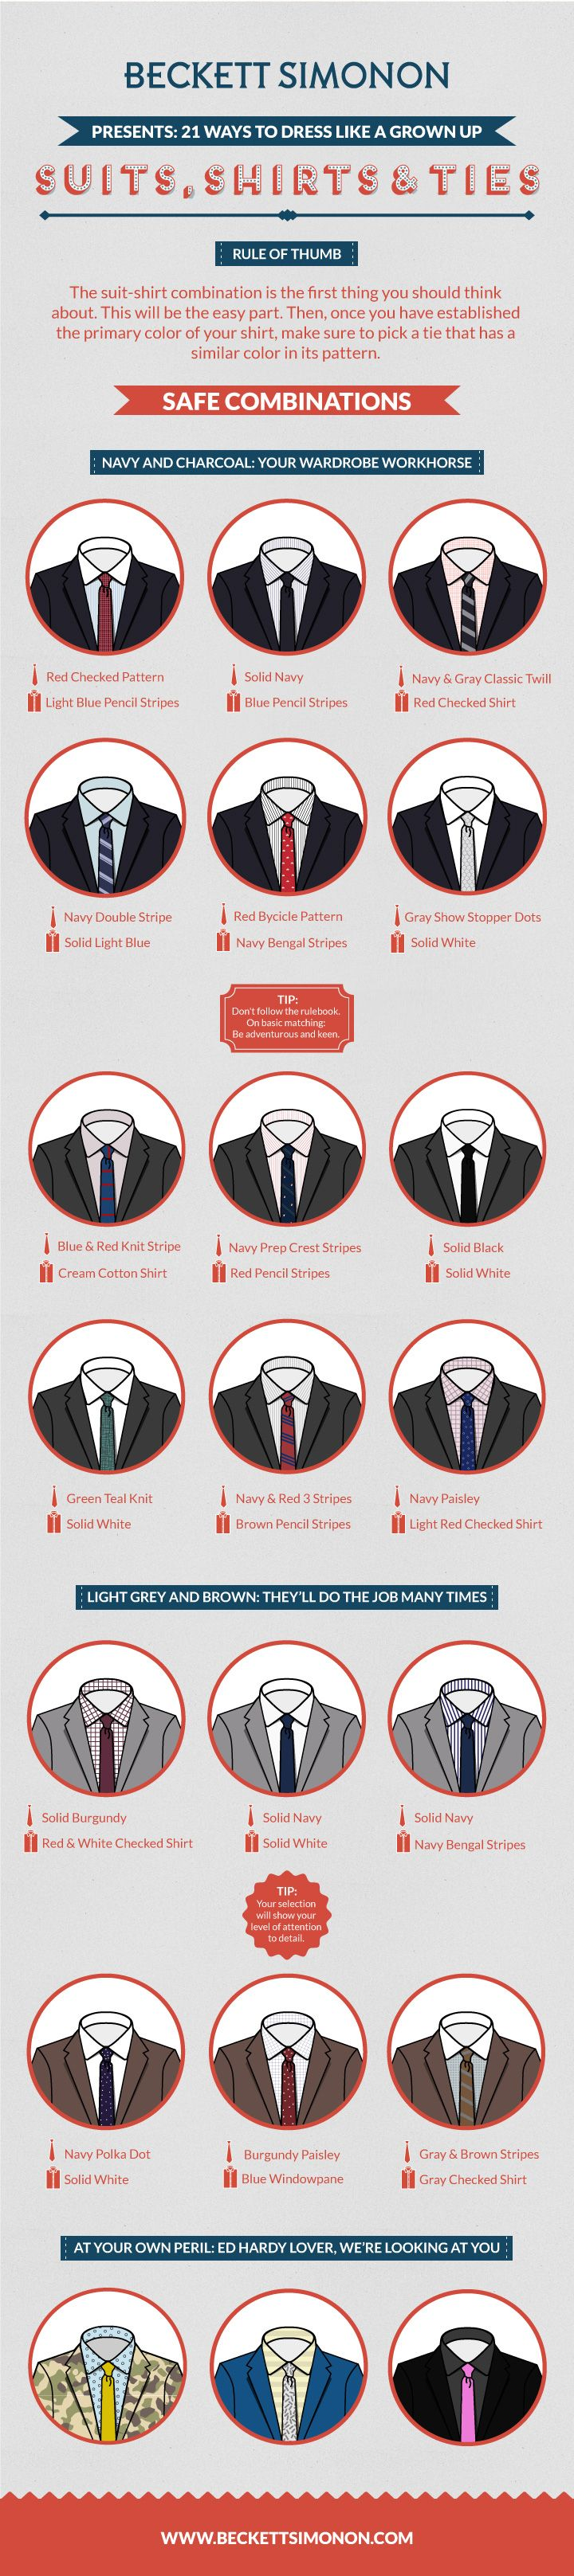 Shirt+tie